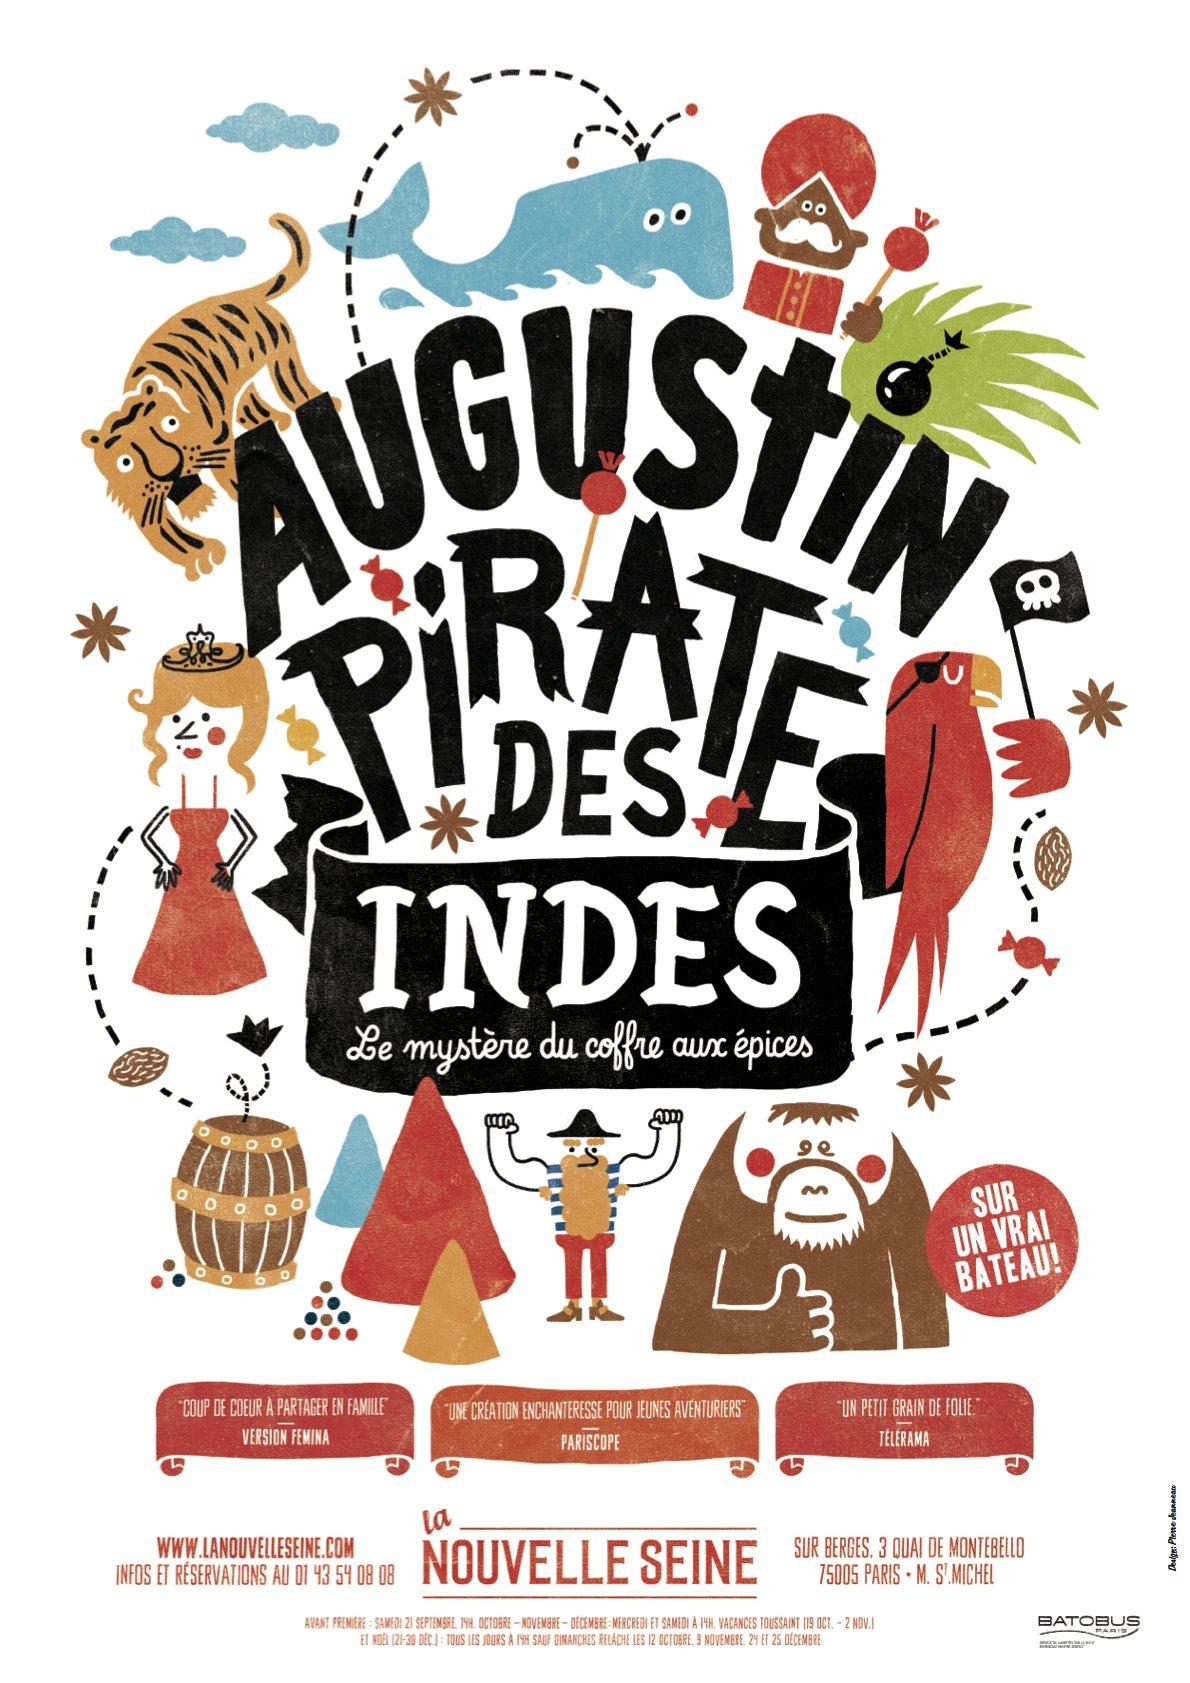 Augustin pirate des Indes